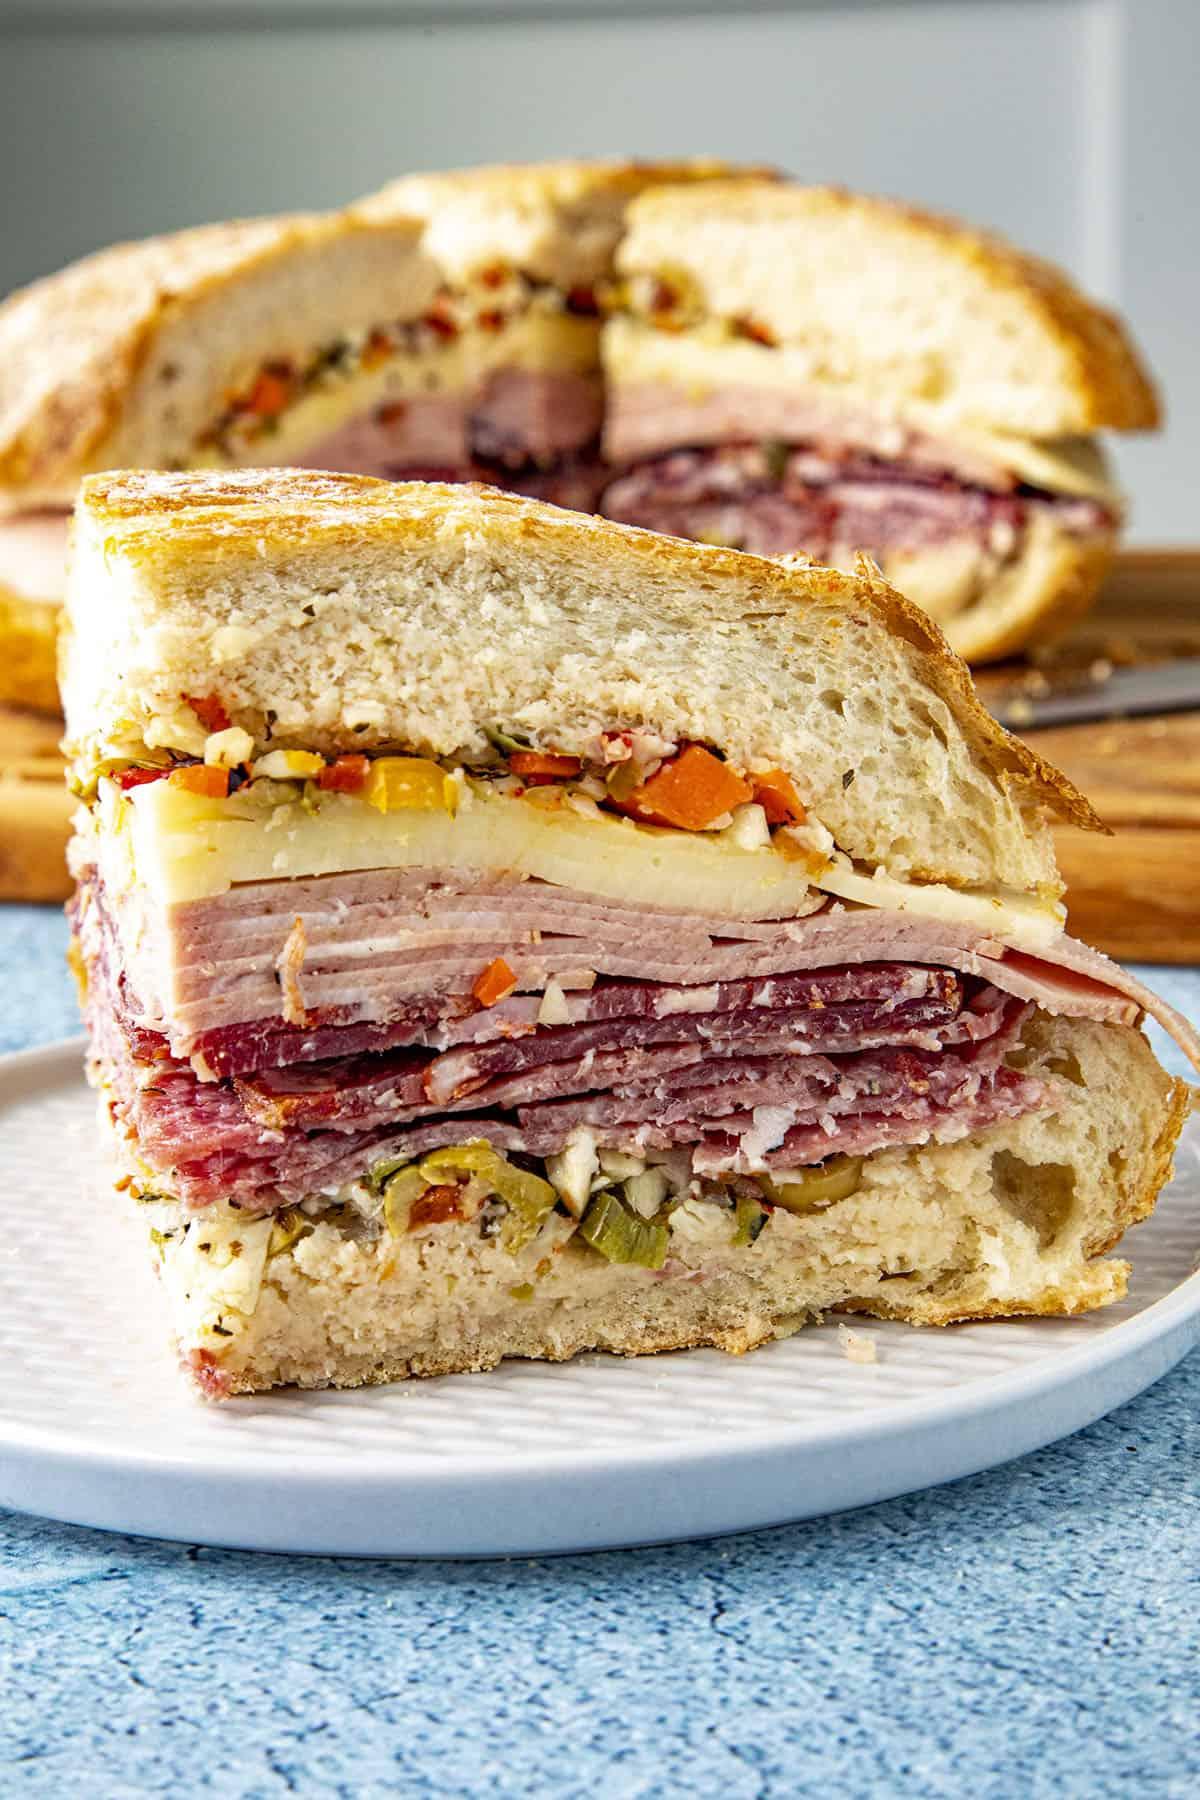 A slice of a Muffaletta sandwich